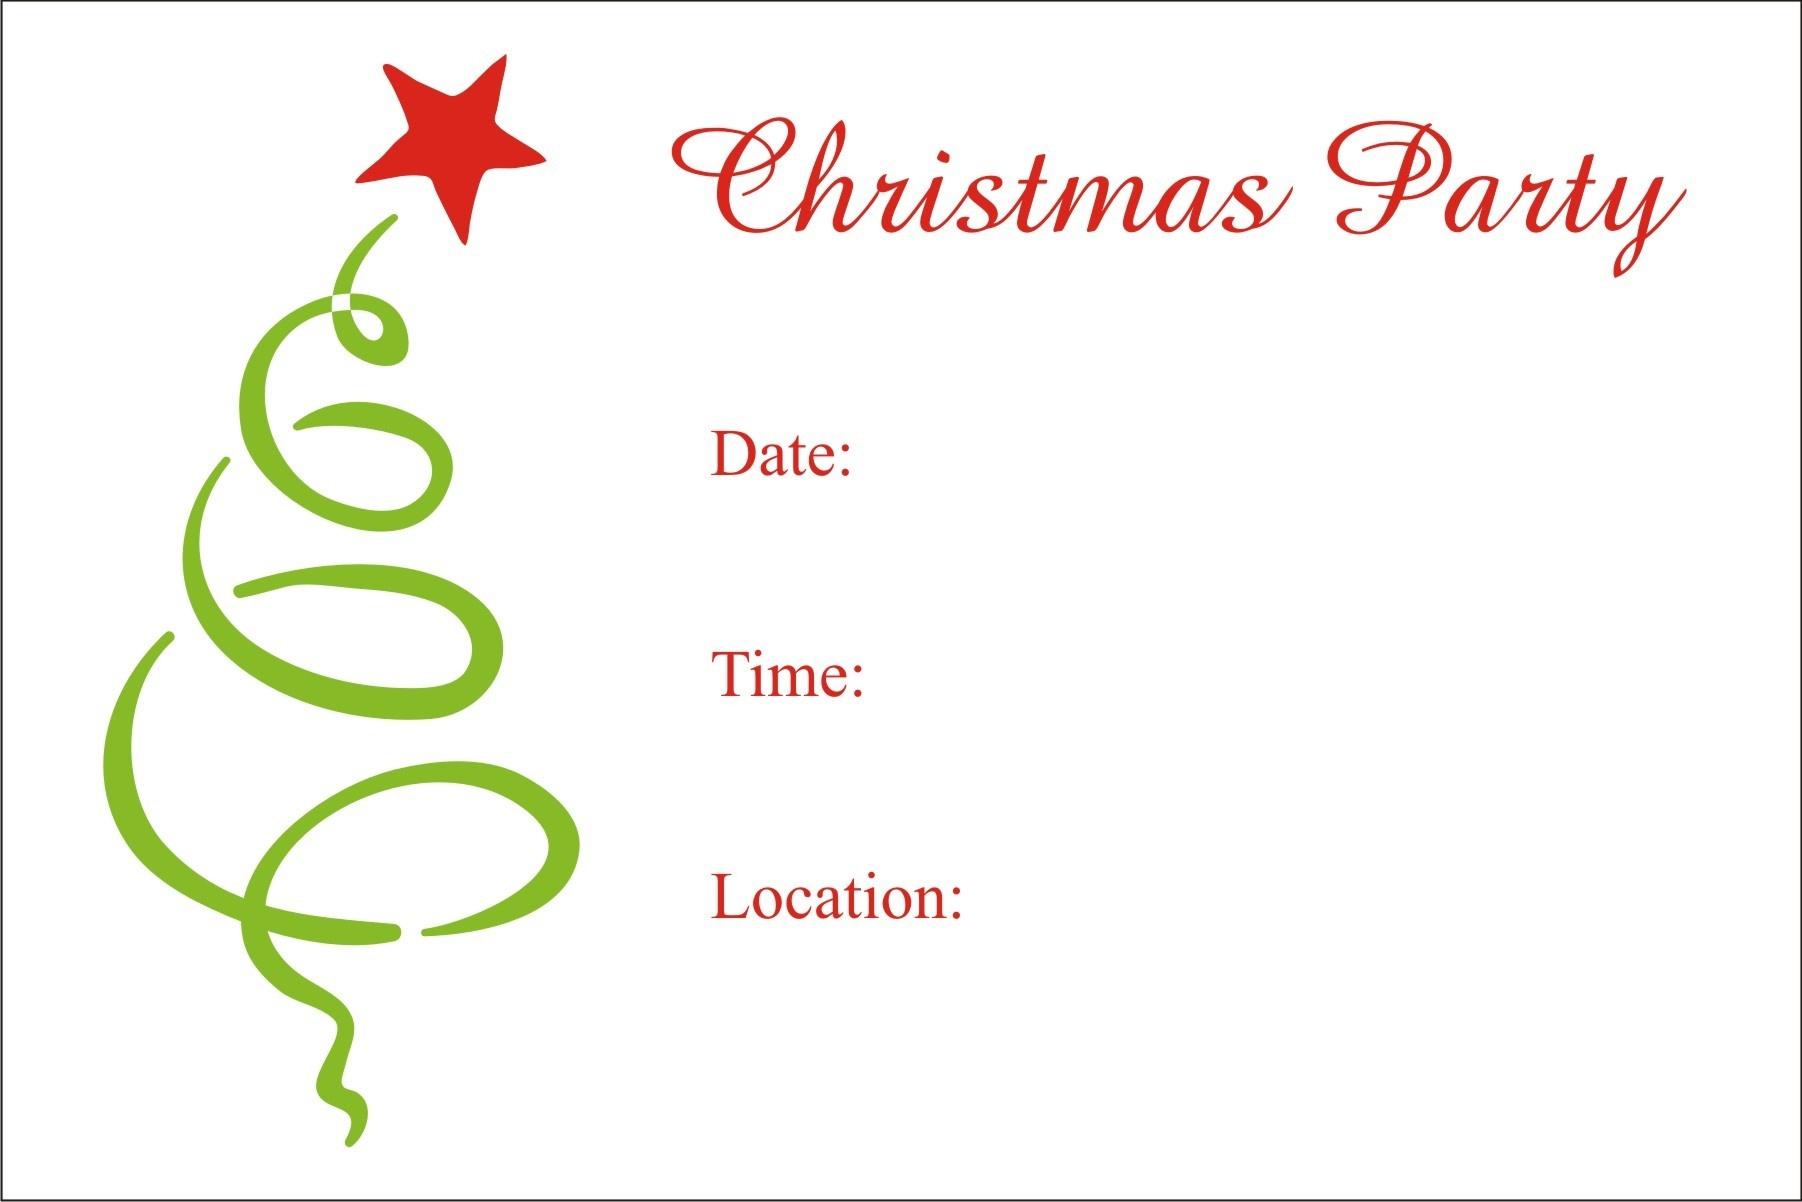 Christmas Party Free Printable Holiday Invitation Personalized Party - Free Printable Christmas Party Invitations